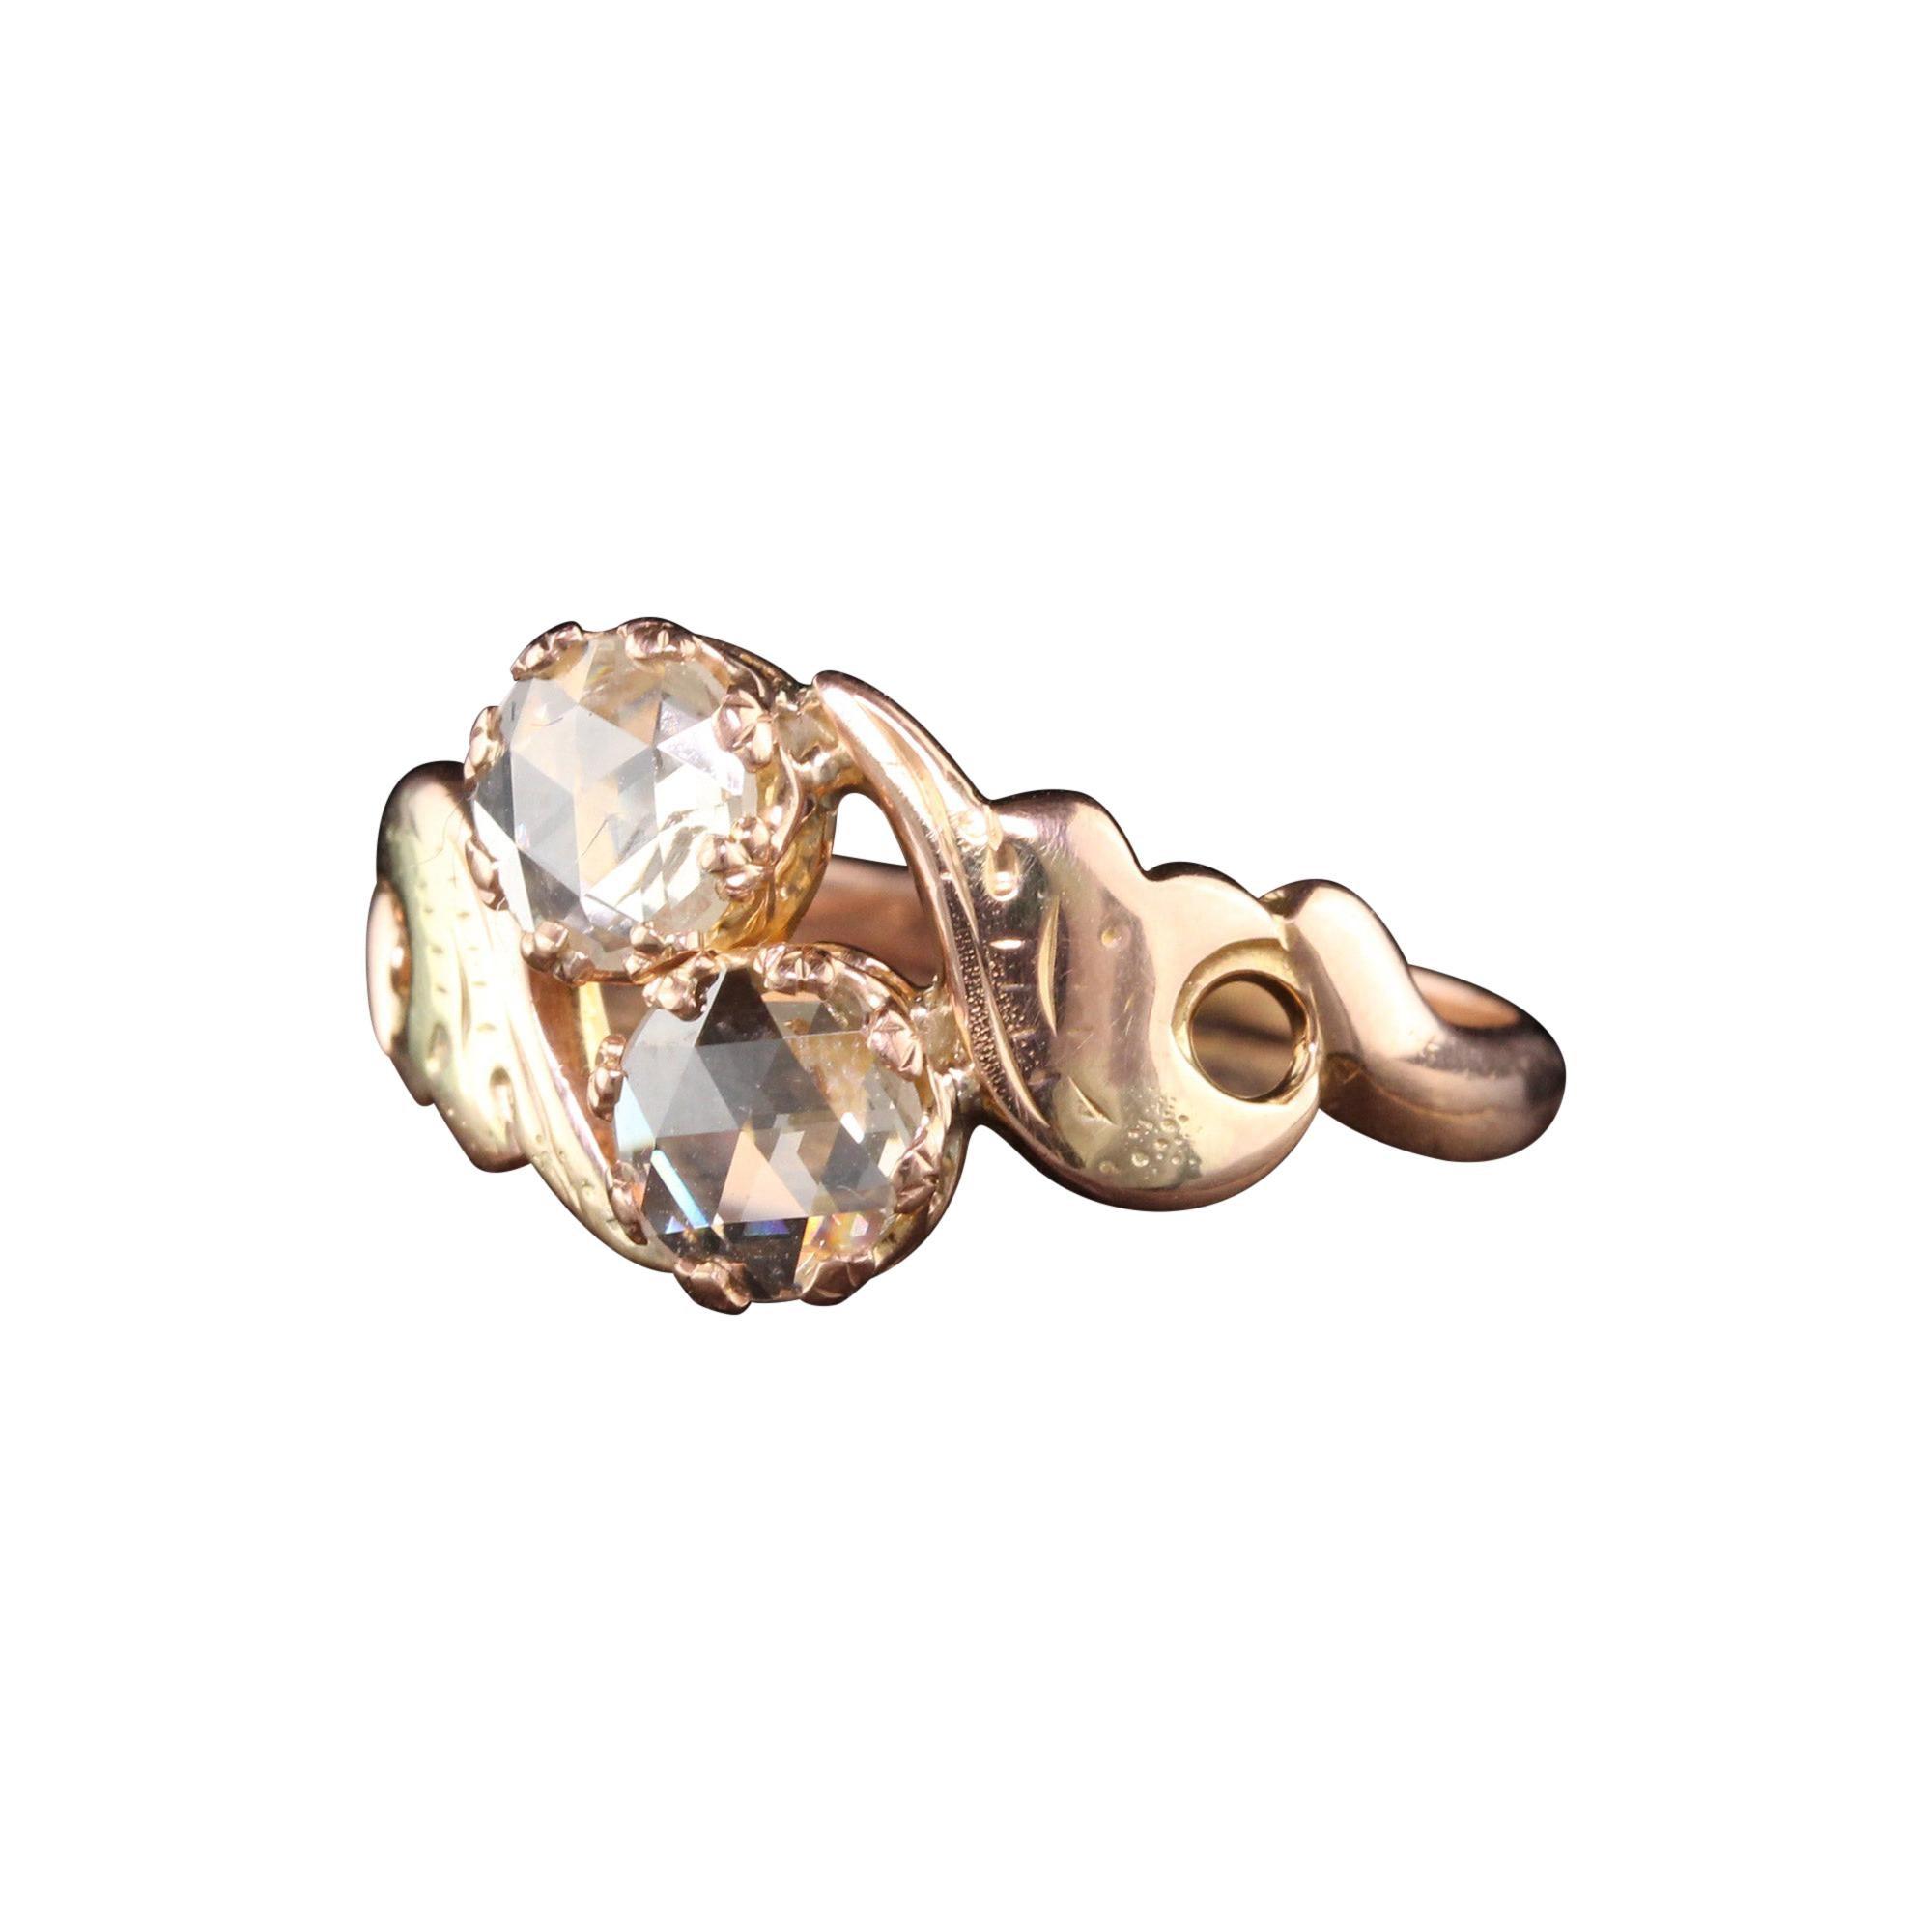 Antique Art Deco 18k Rose Gold Rose Cut Diamond Toi et Moi Ring